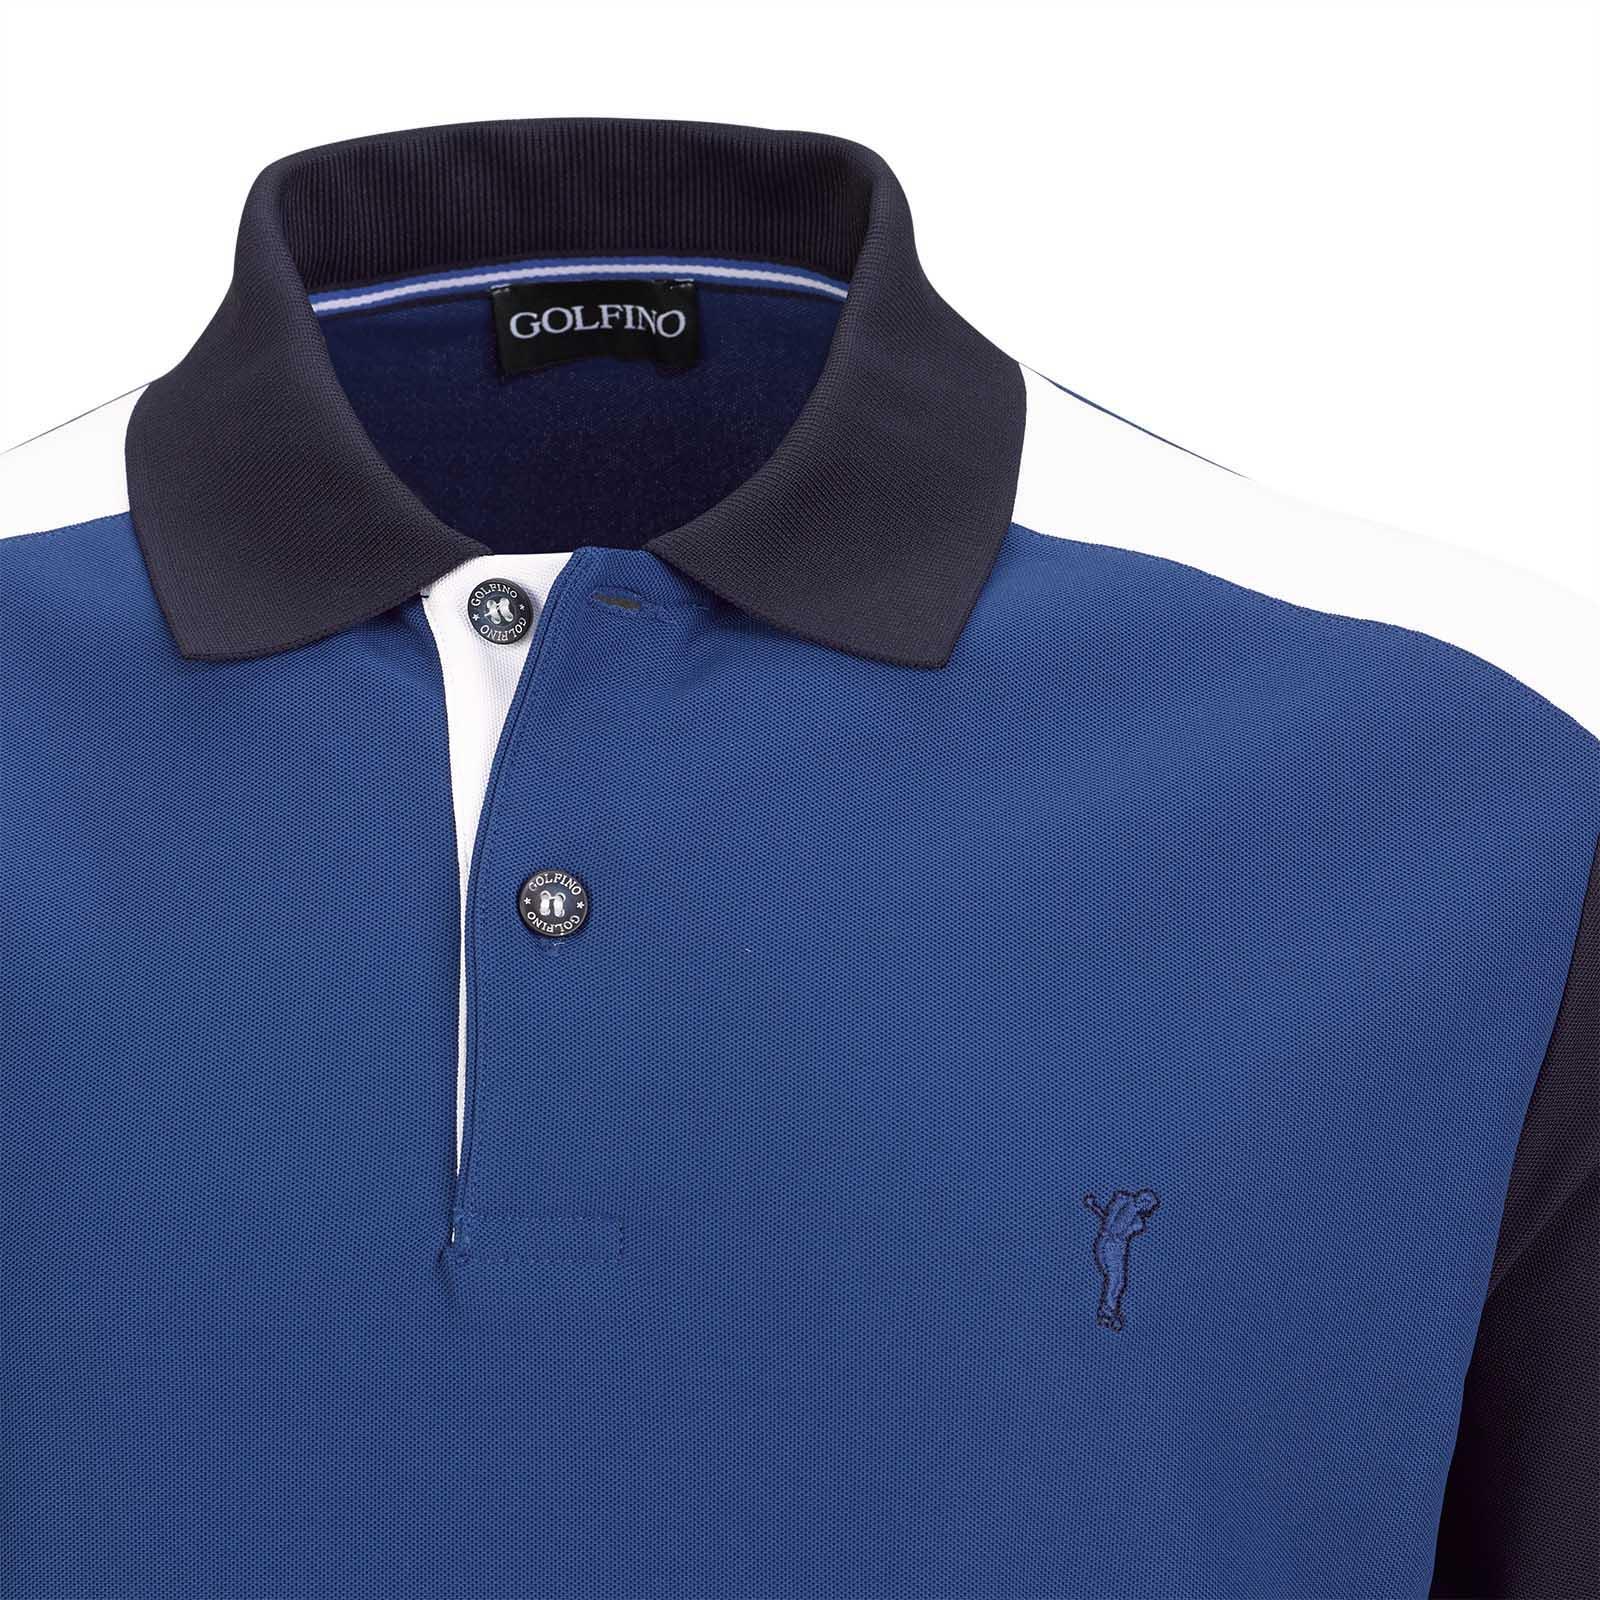 Herren Kurzarm Funktions-Golfpolo mit Moisture Management im Pro Look